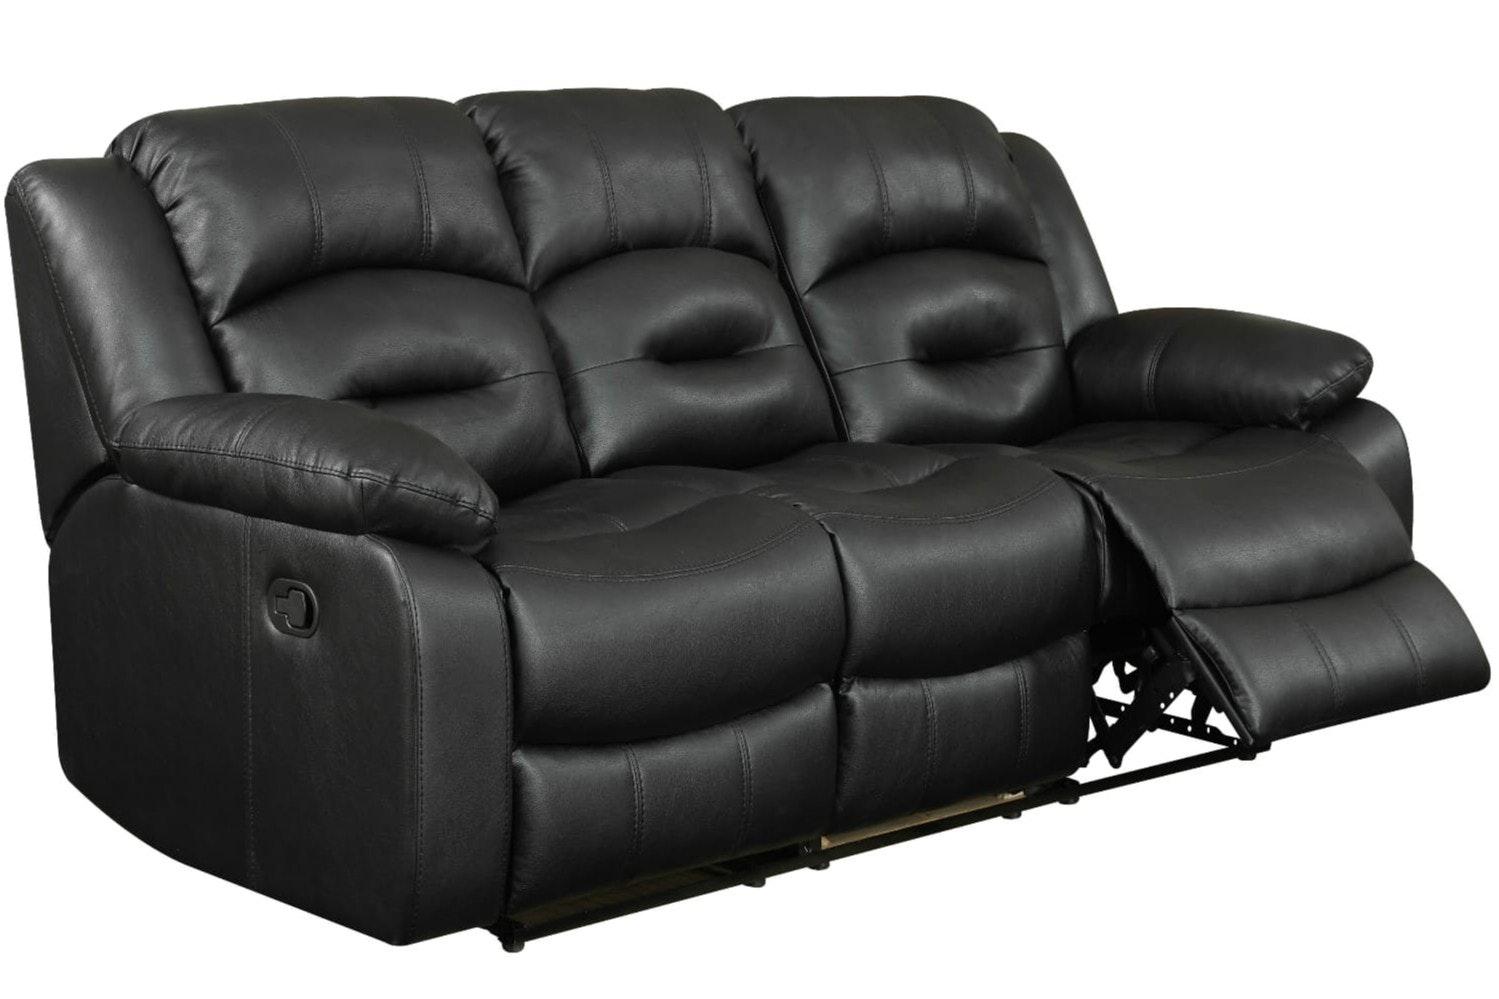 three seater recliner sofa 3 seater electric hunter seater recliner sofa black harvey norman sofas ireland